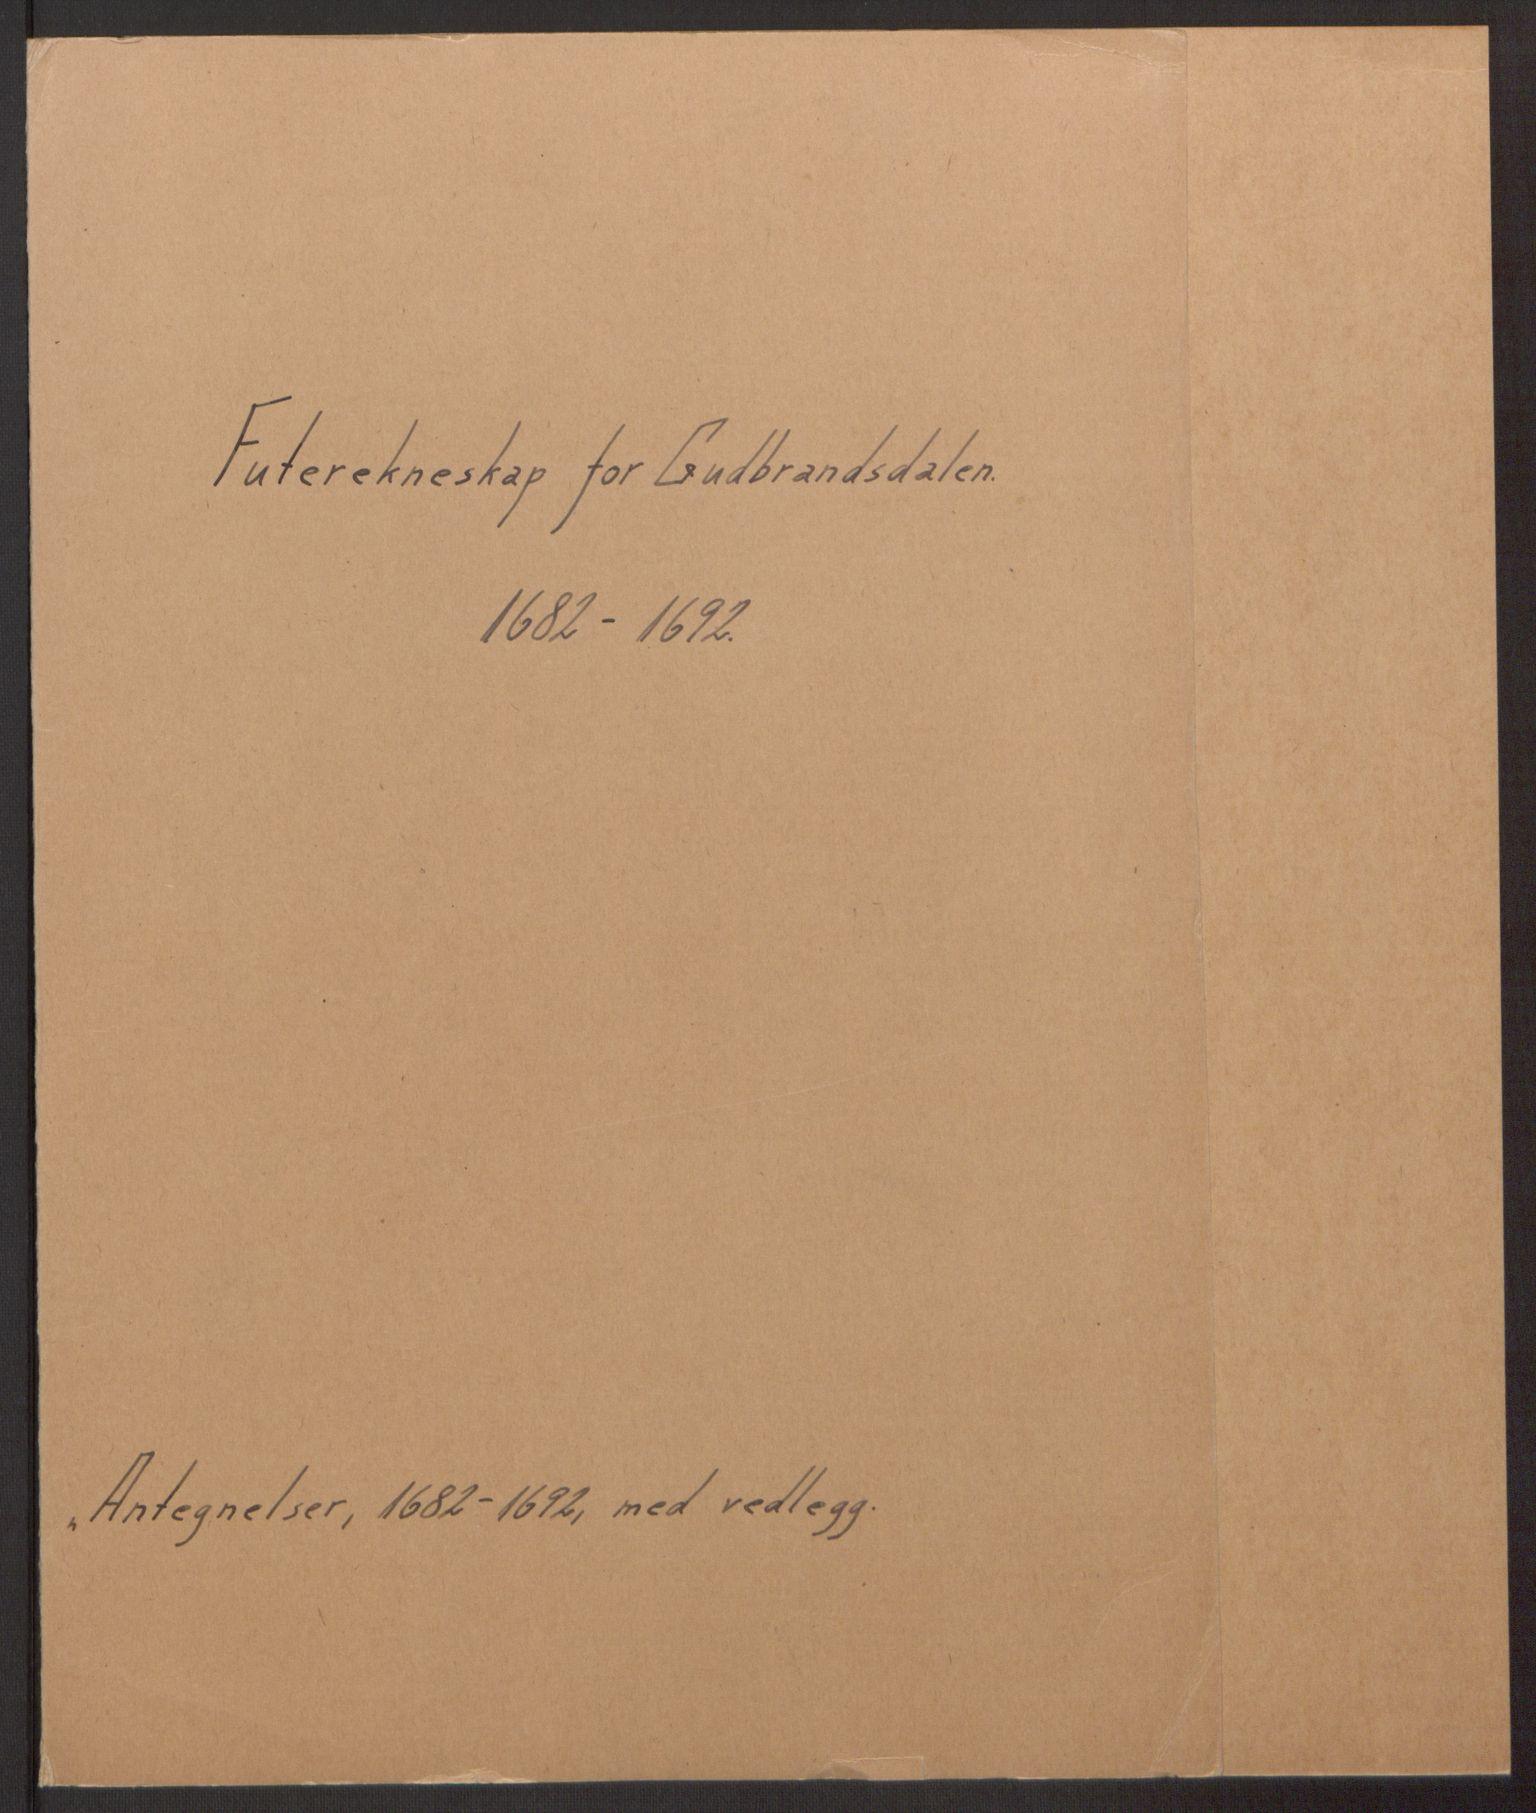 RA, Rentekammeret inntil 1814, Reviderte regnskaper, Fogderegnskap, R17/L1166: Fogderegnskap Gudbrandsdal, 1690-1692, s. 168